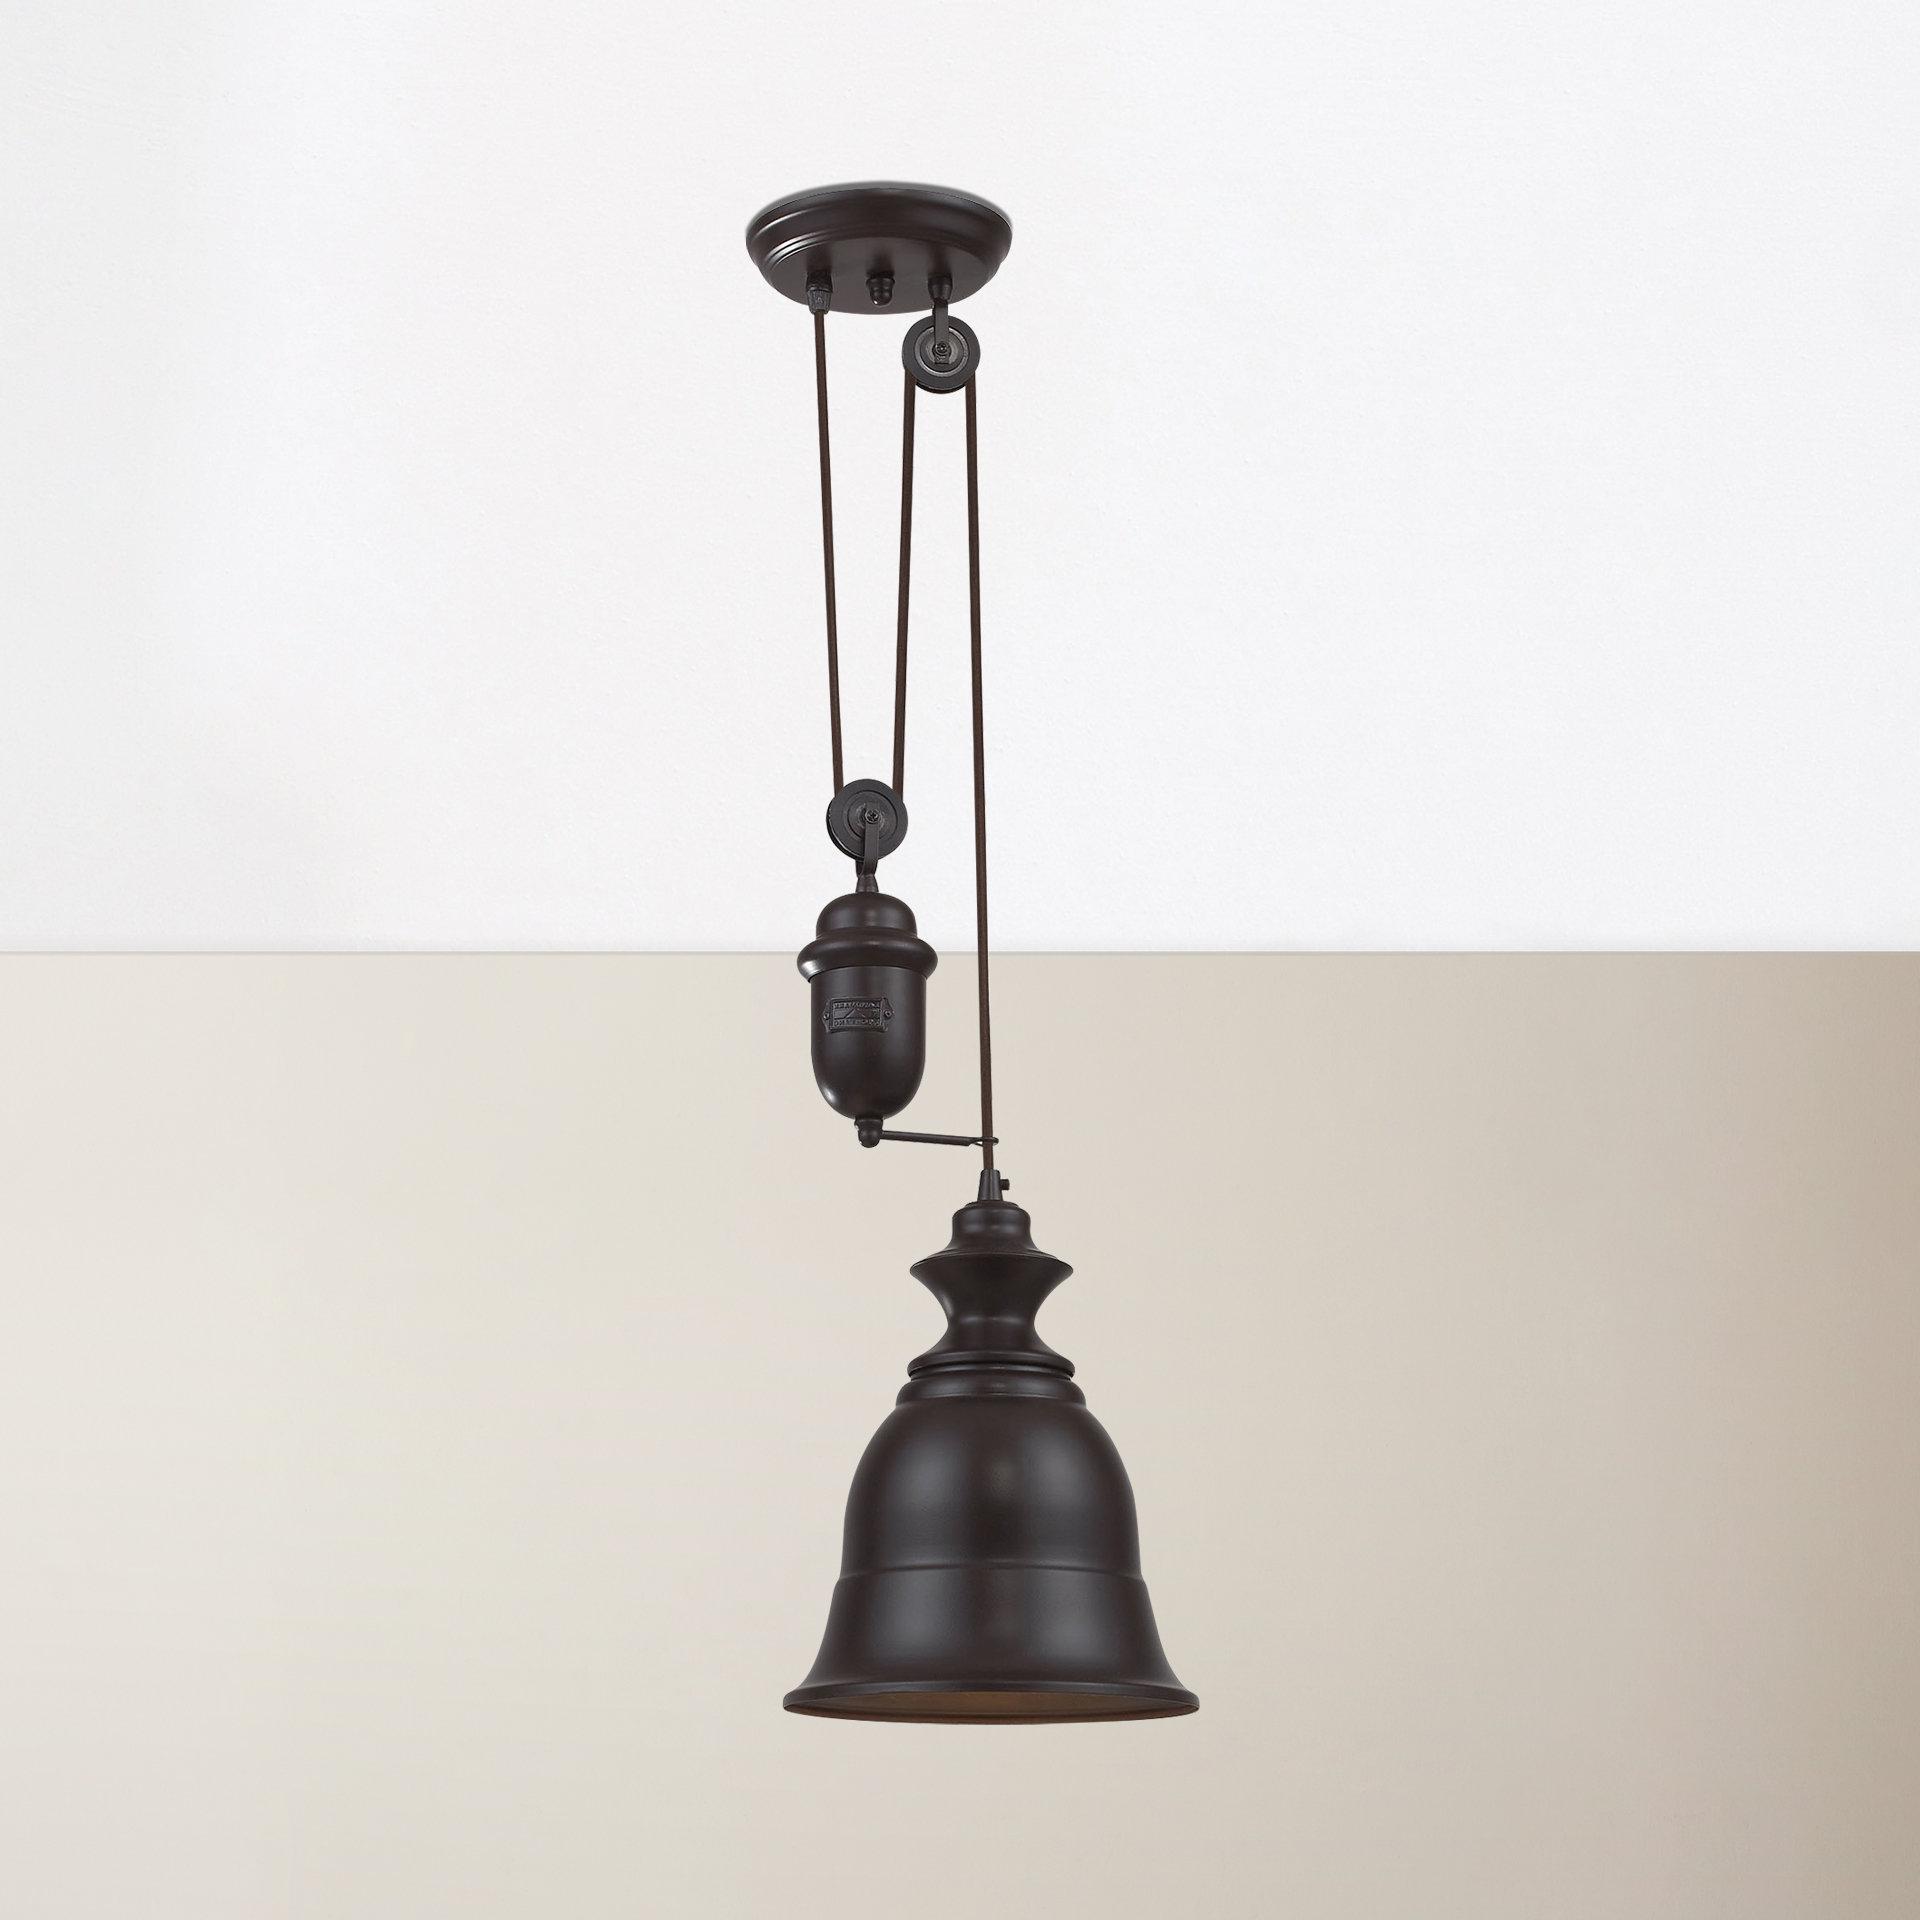 Trendy Erico 1 Light Single Bell Pendants With Regard To August Grove Elsenborn 1 Light Single Bell Pendant (View 23 of 25)